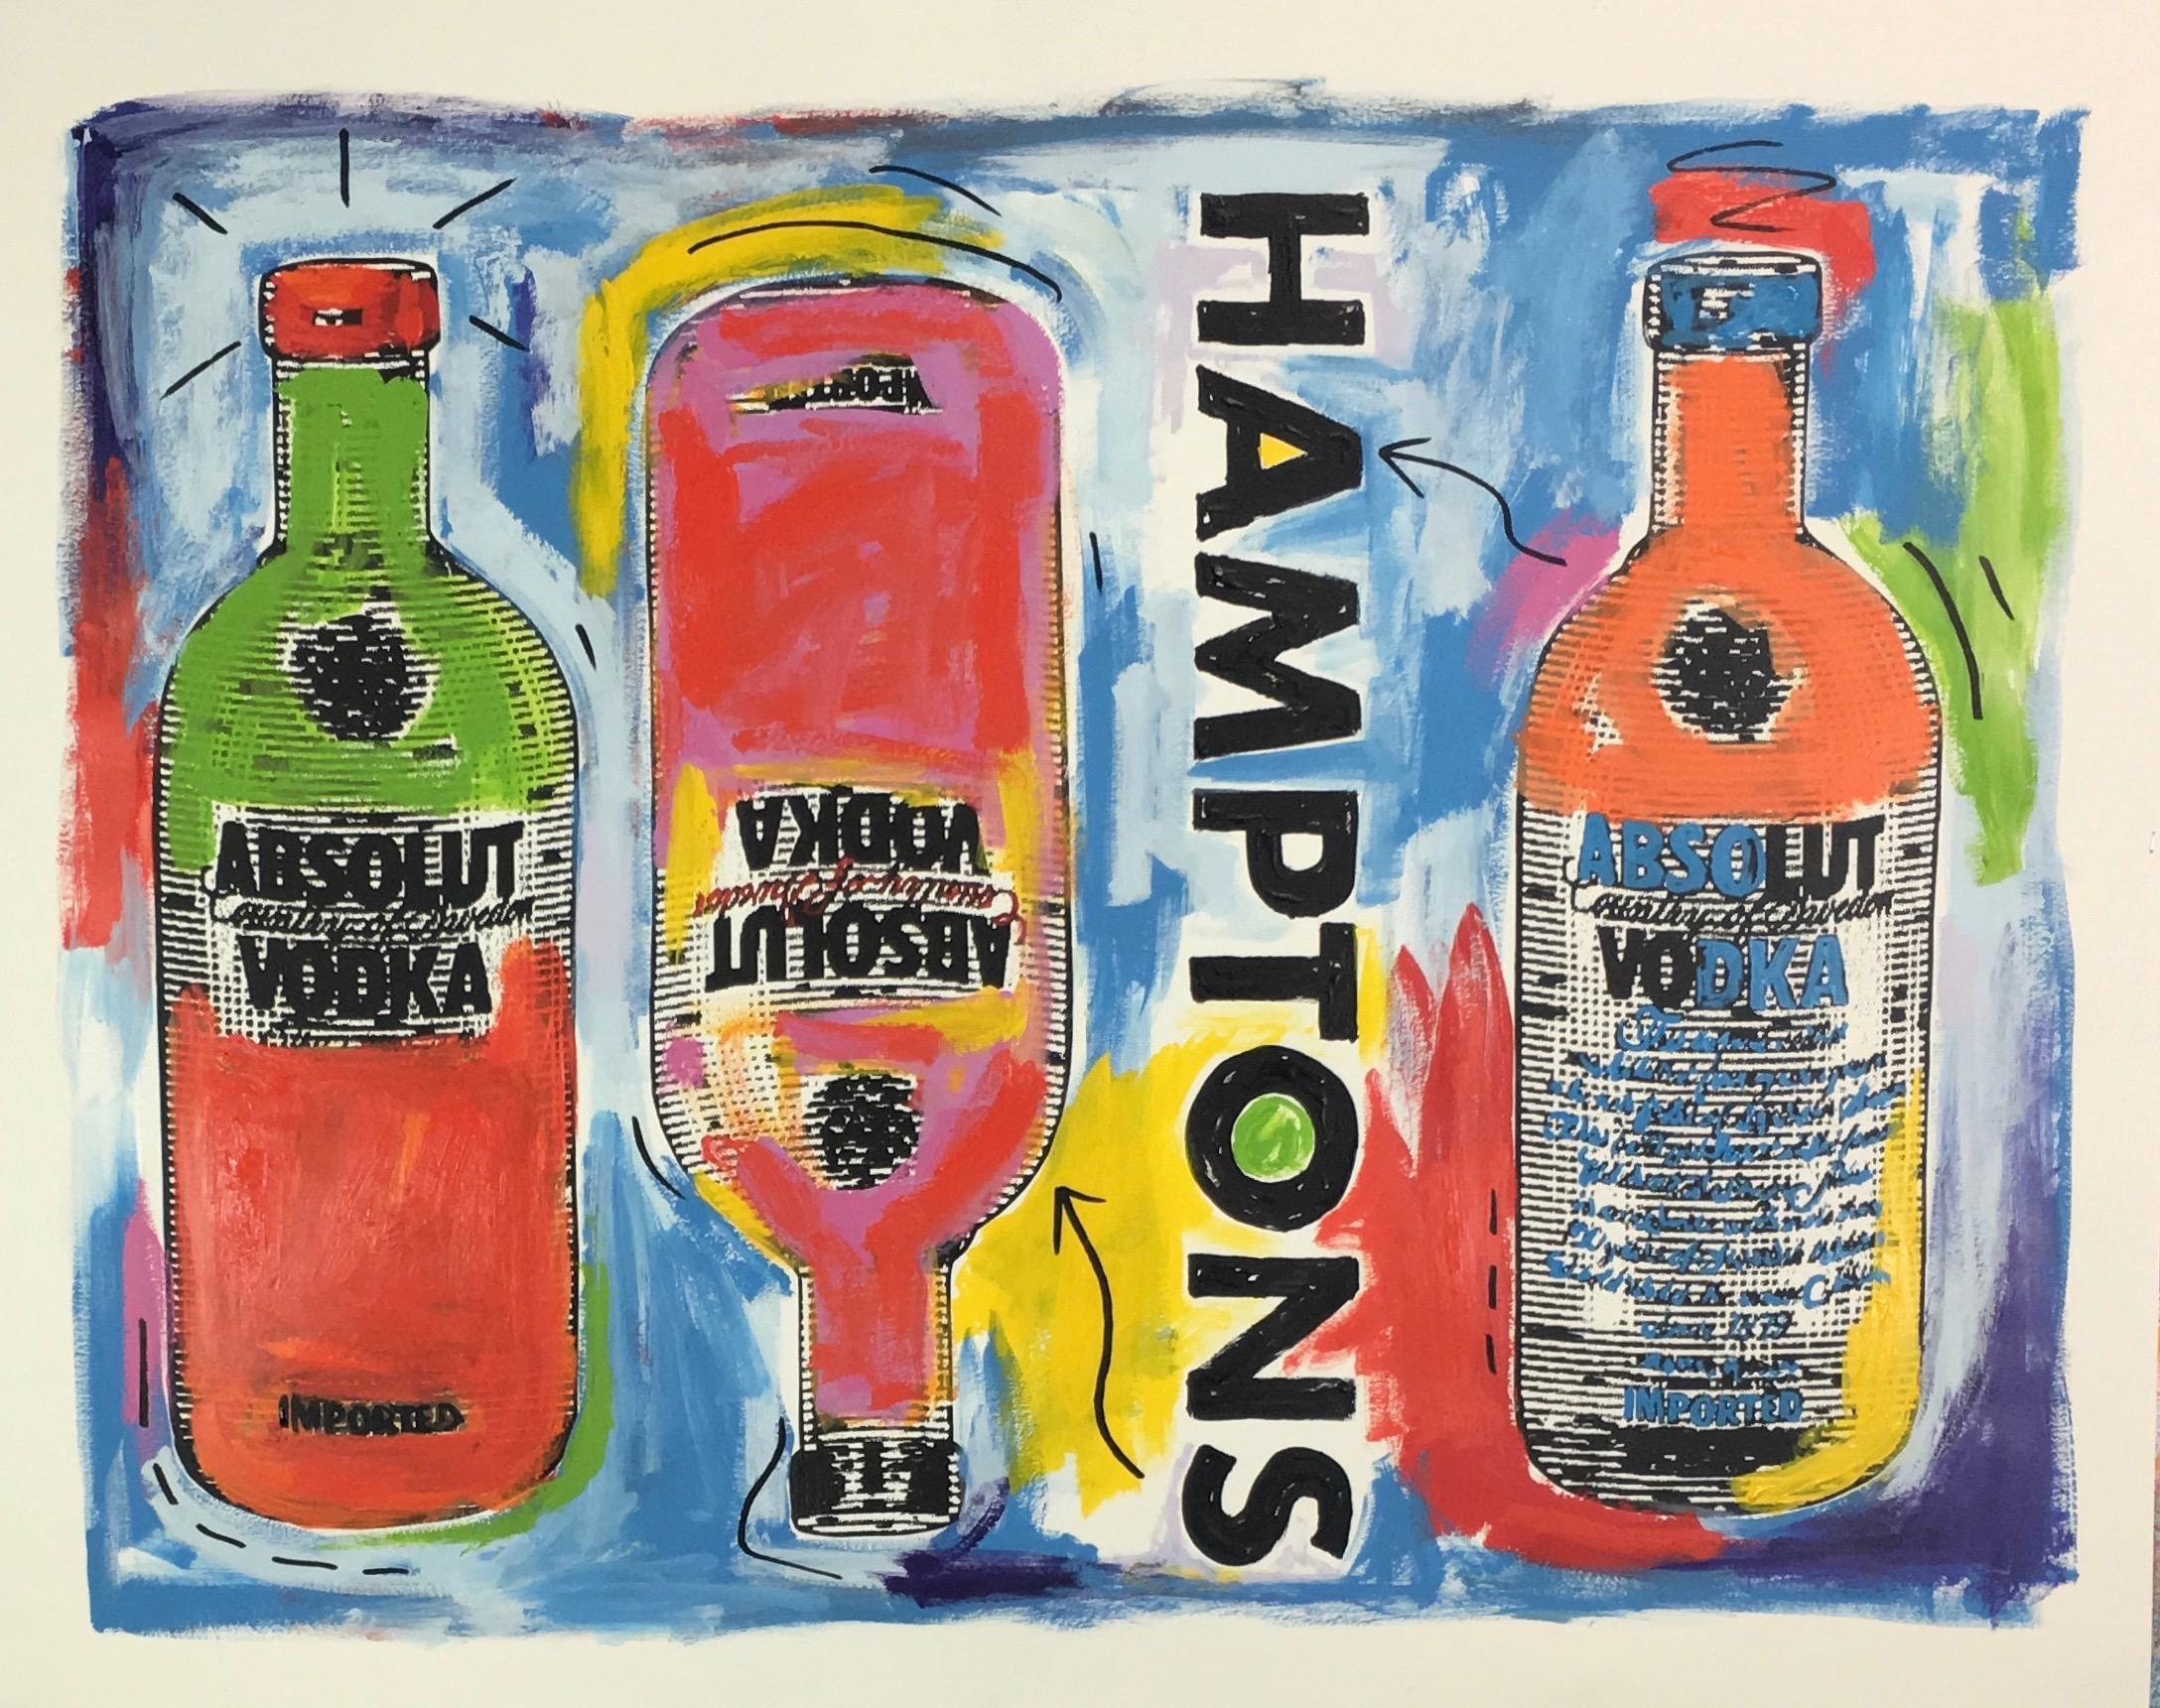 PAPER ABSOLUT HAMPTONS BLUE copy.jpg